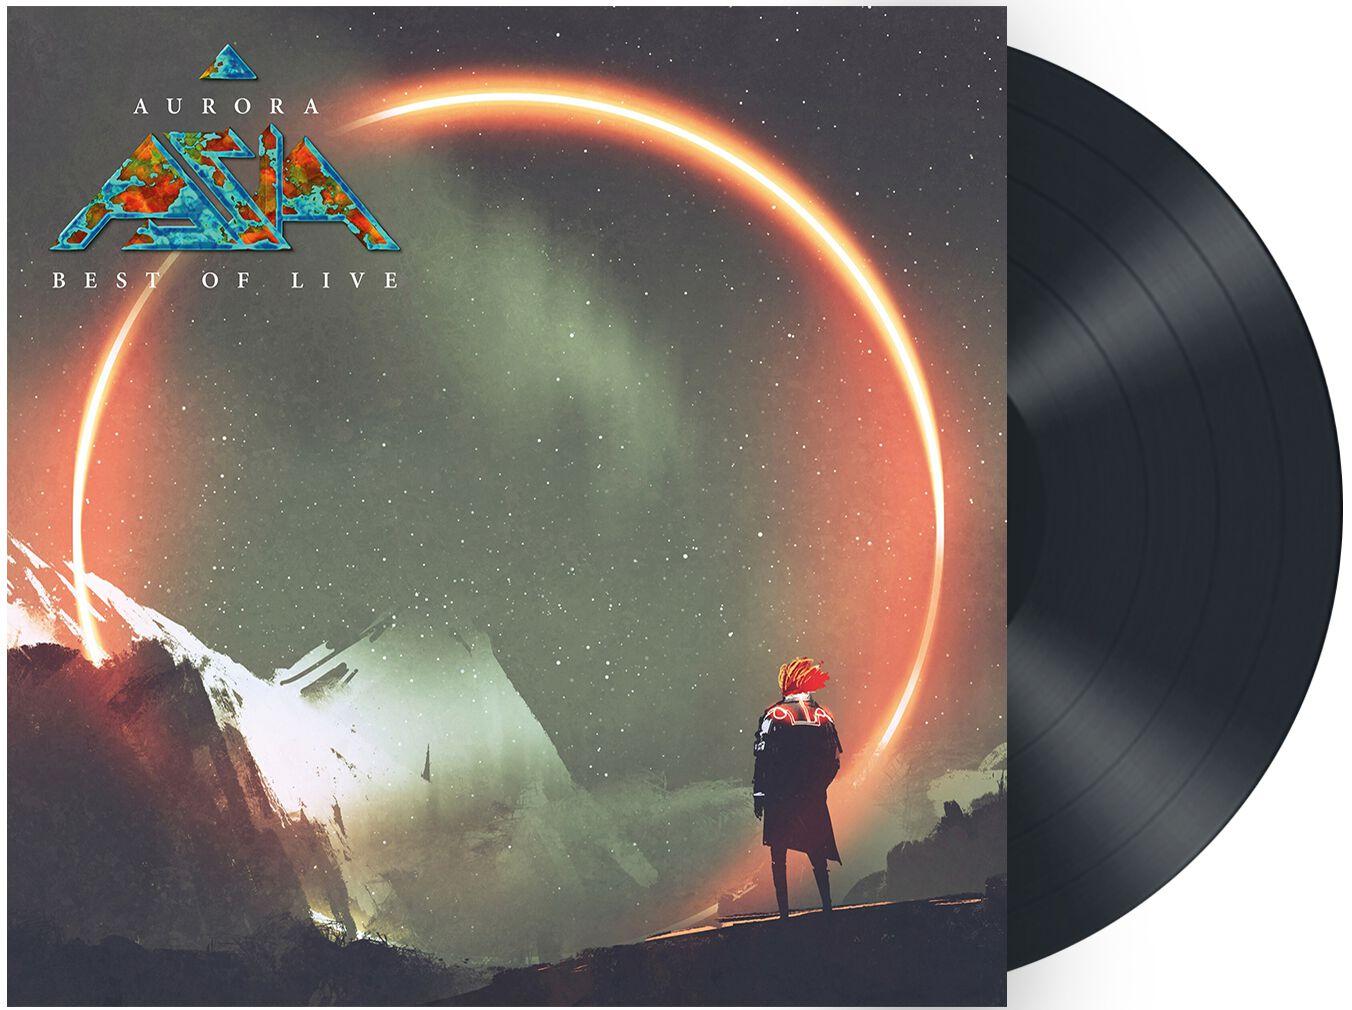 Image of Asia Aurora - Best of live LP Standard